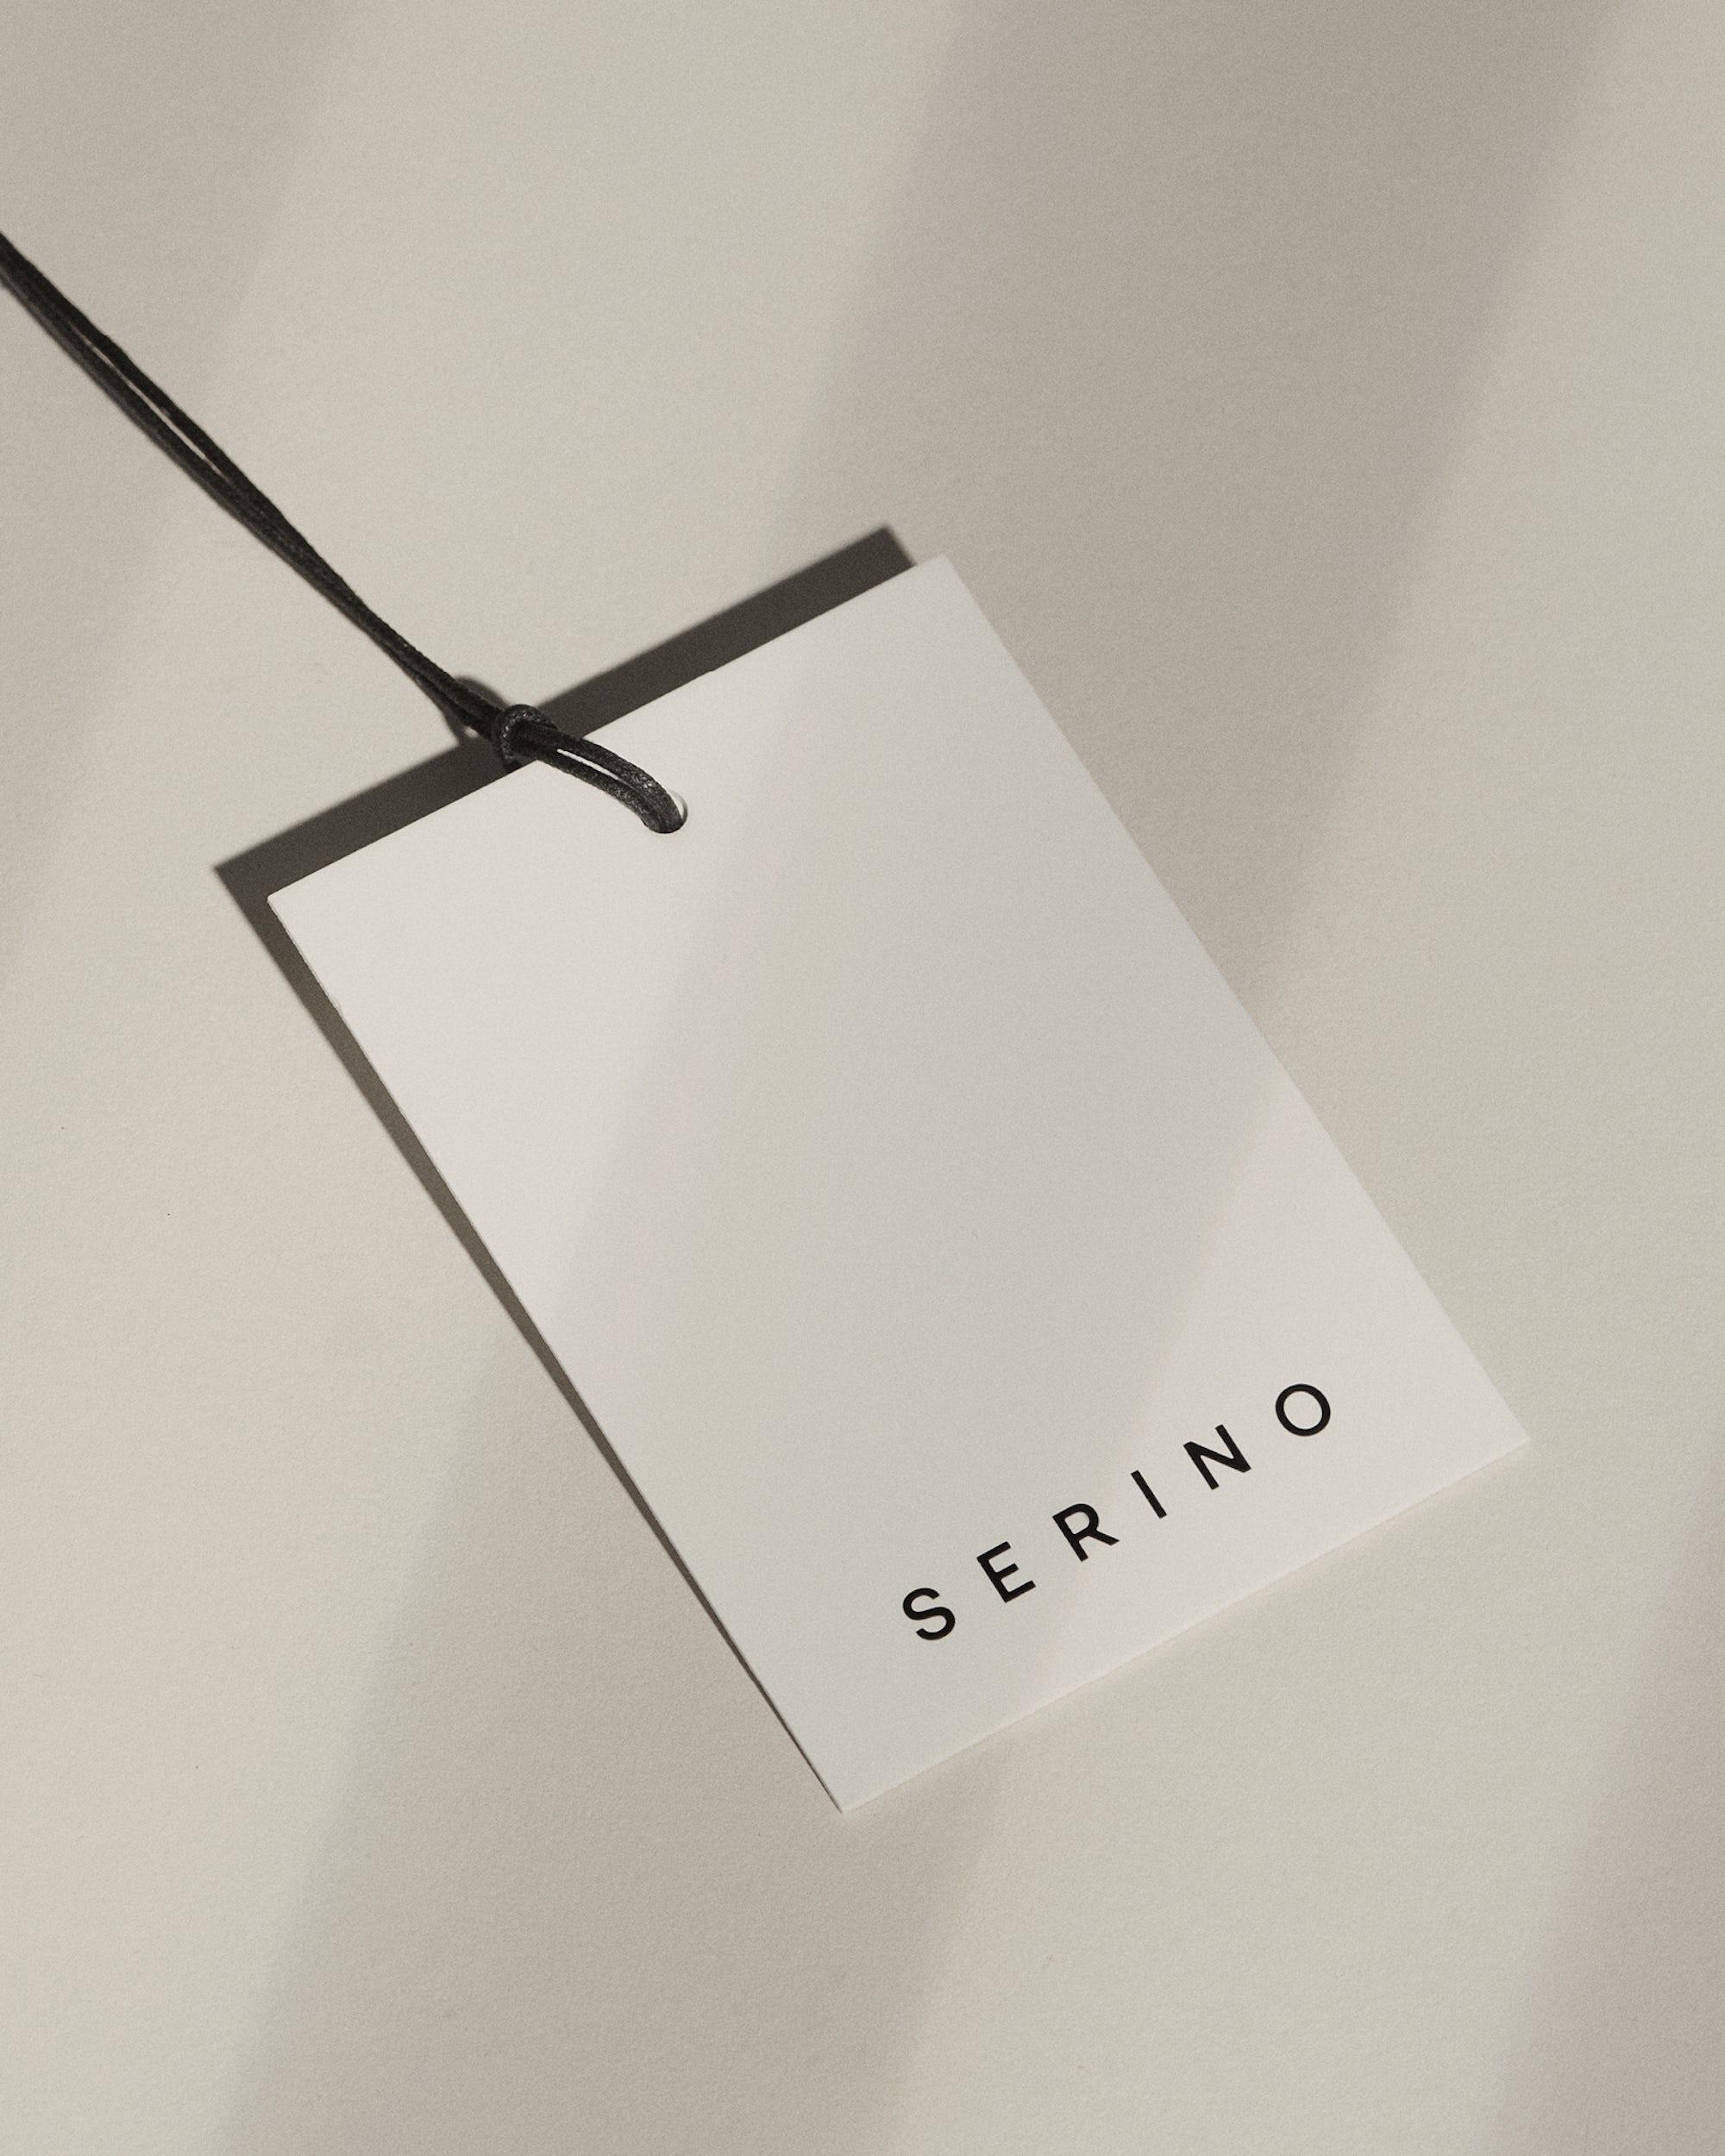 Serino Studio - Hangtag Design